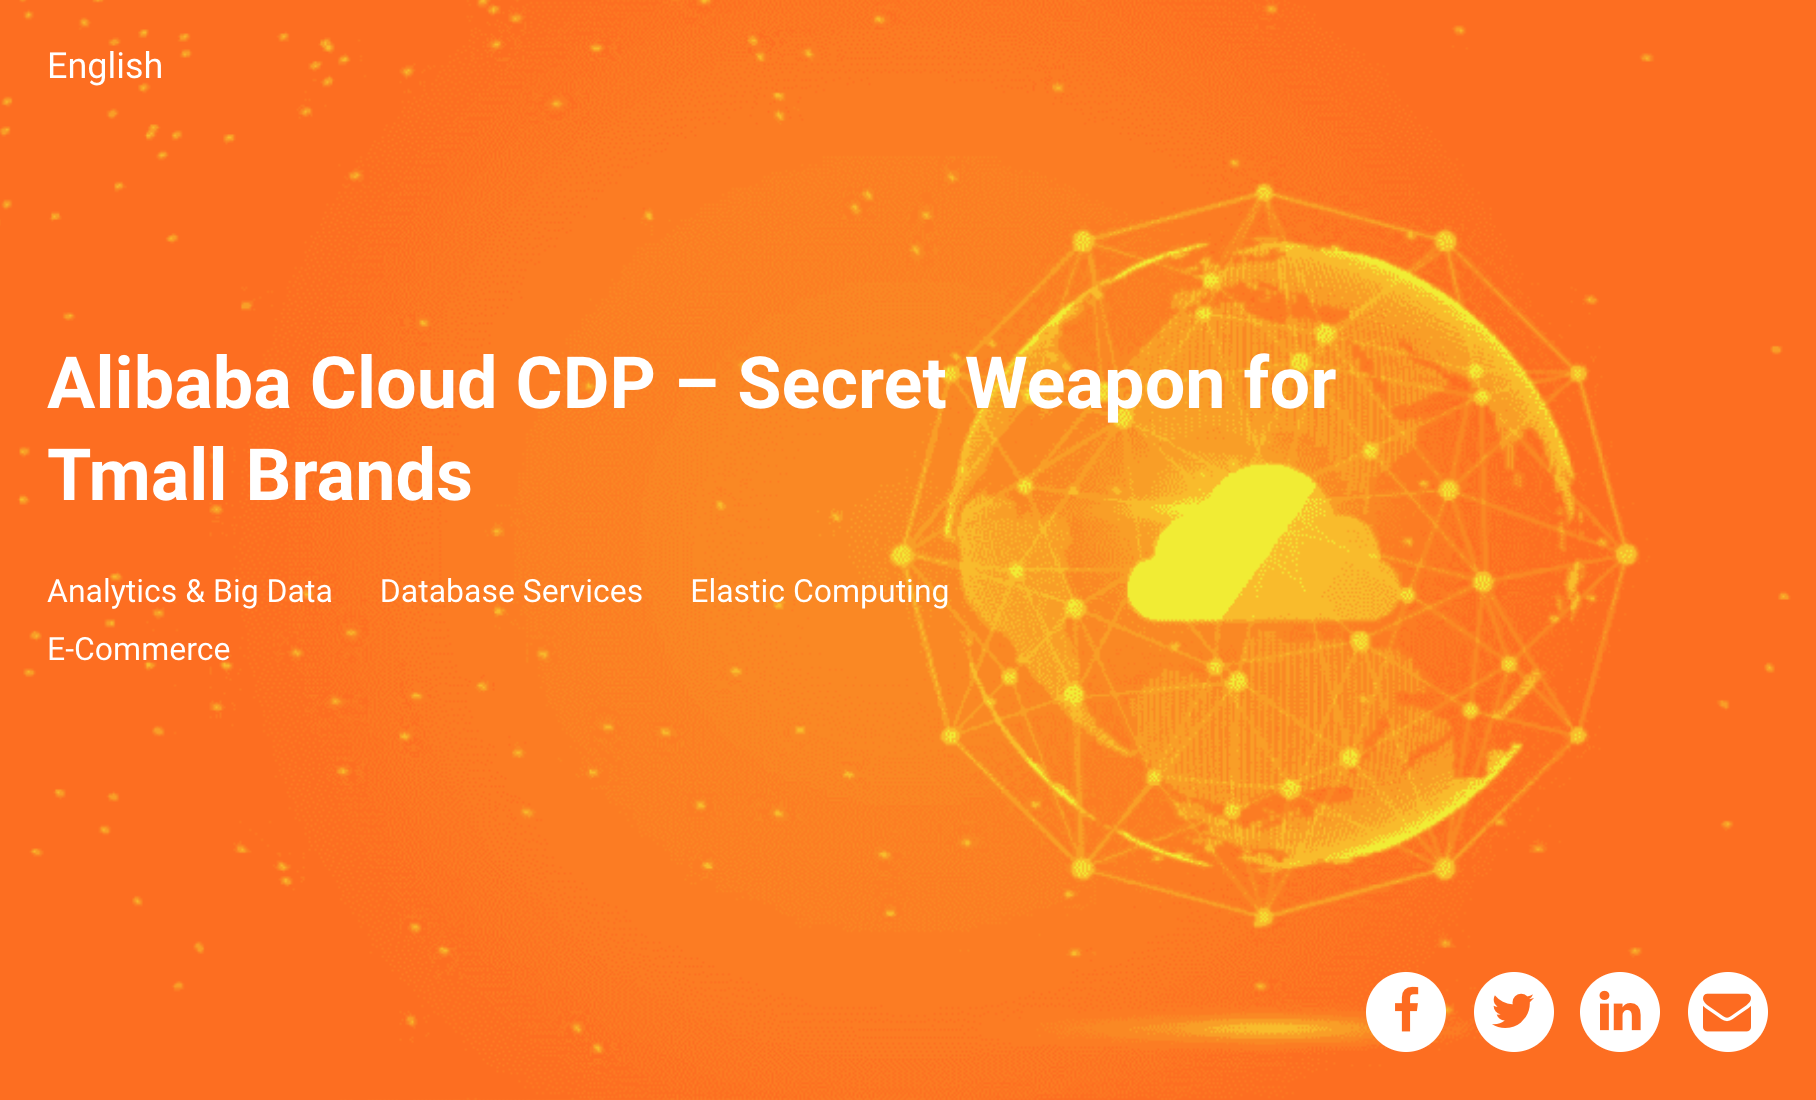 Alibaba Cloud Webinar: Alibaba Cloud CDP – Secret Weapon for Tmall Brands